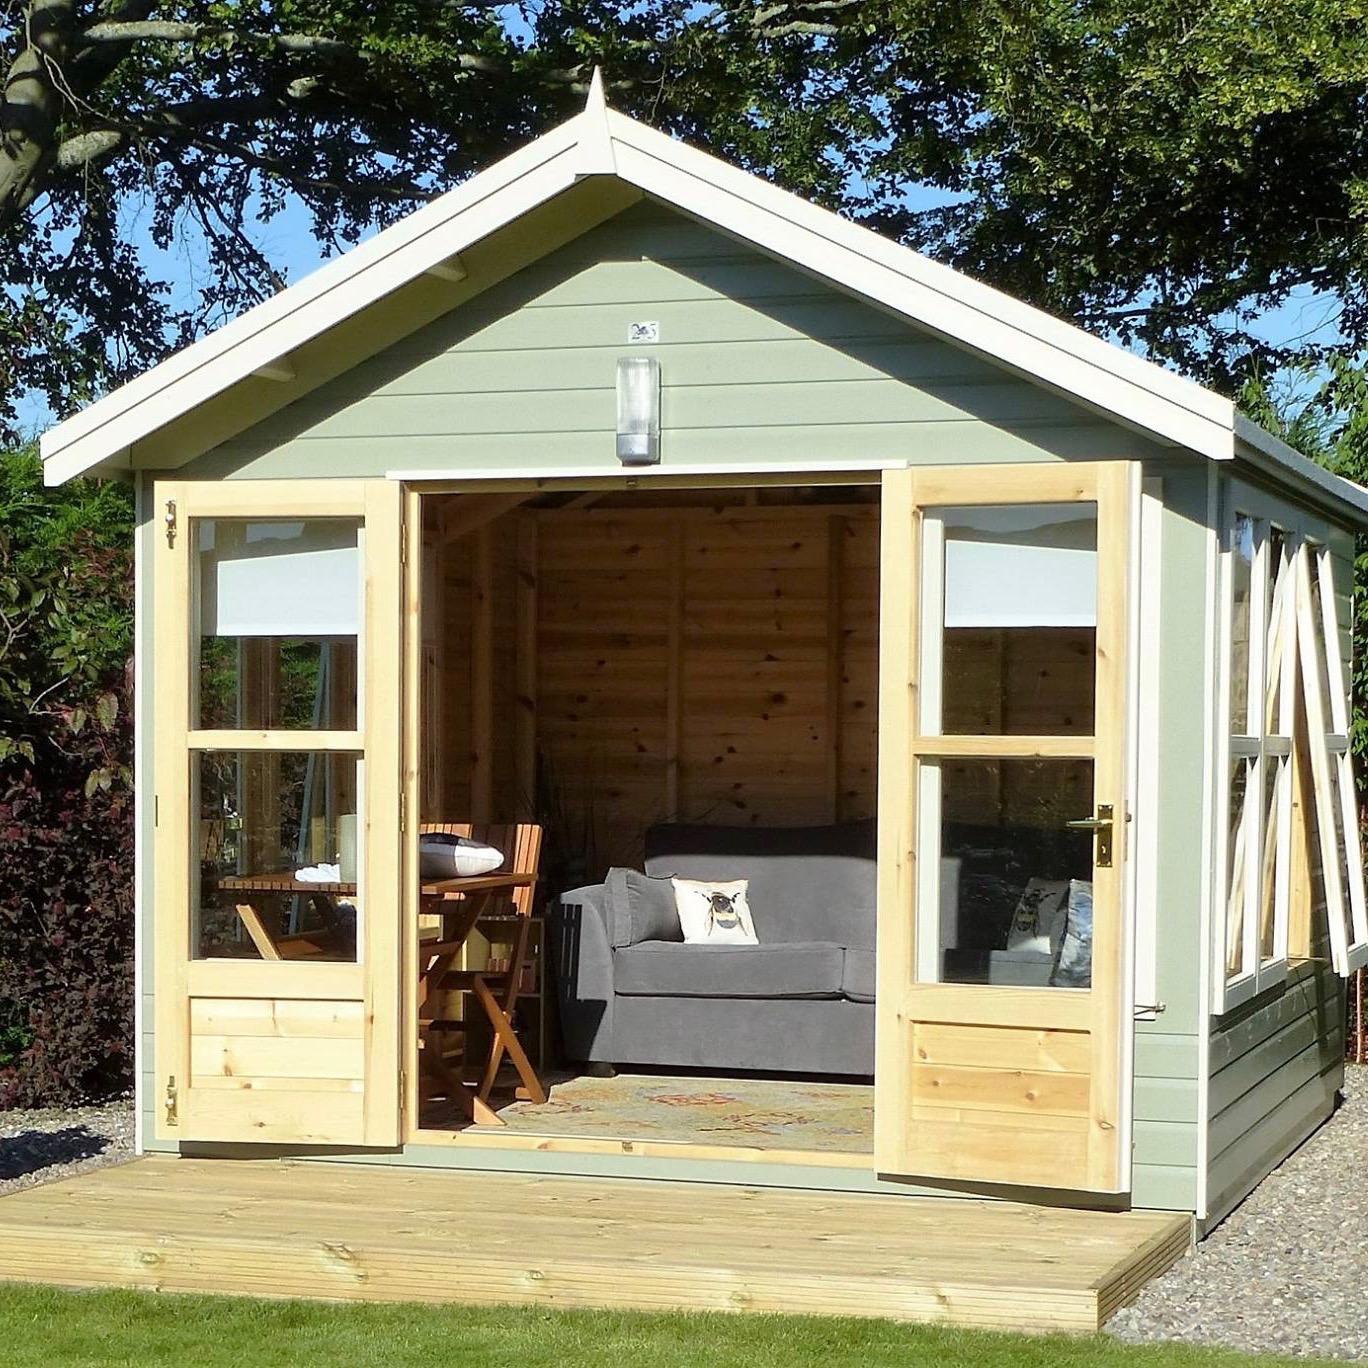 Rannoch Summerhouse - Gillies and Mackay